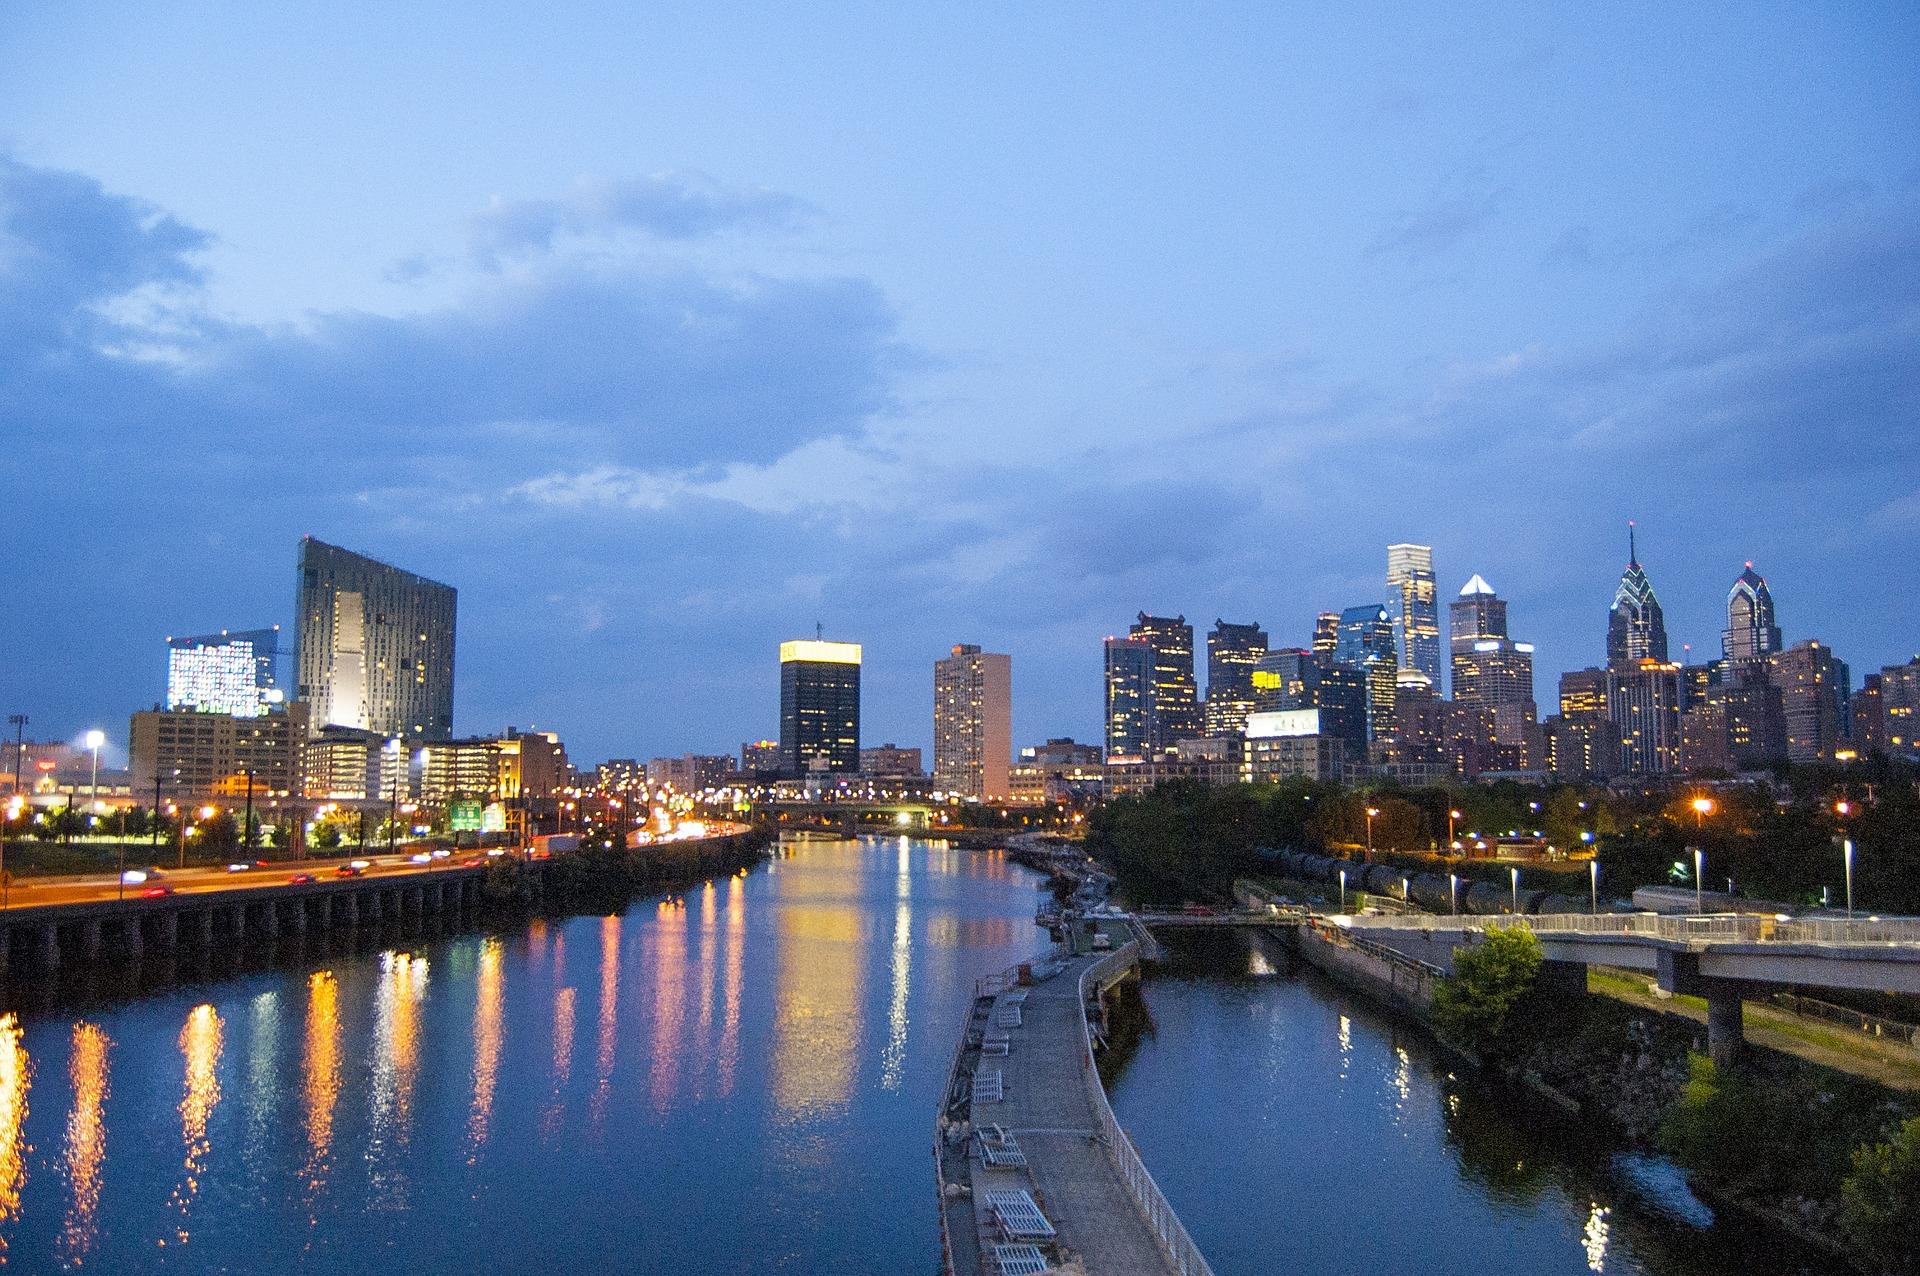 State of the City - Philadelphia, Pa